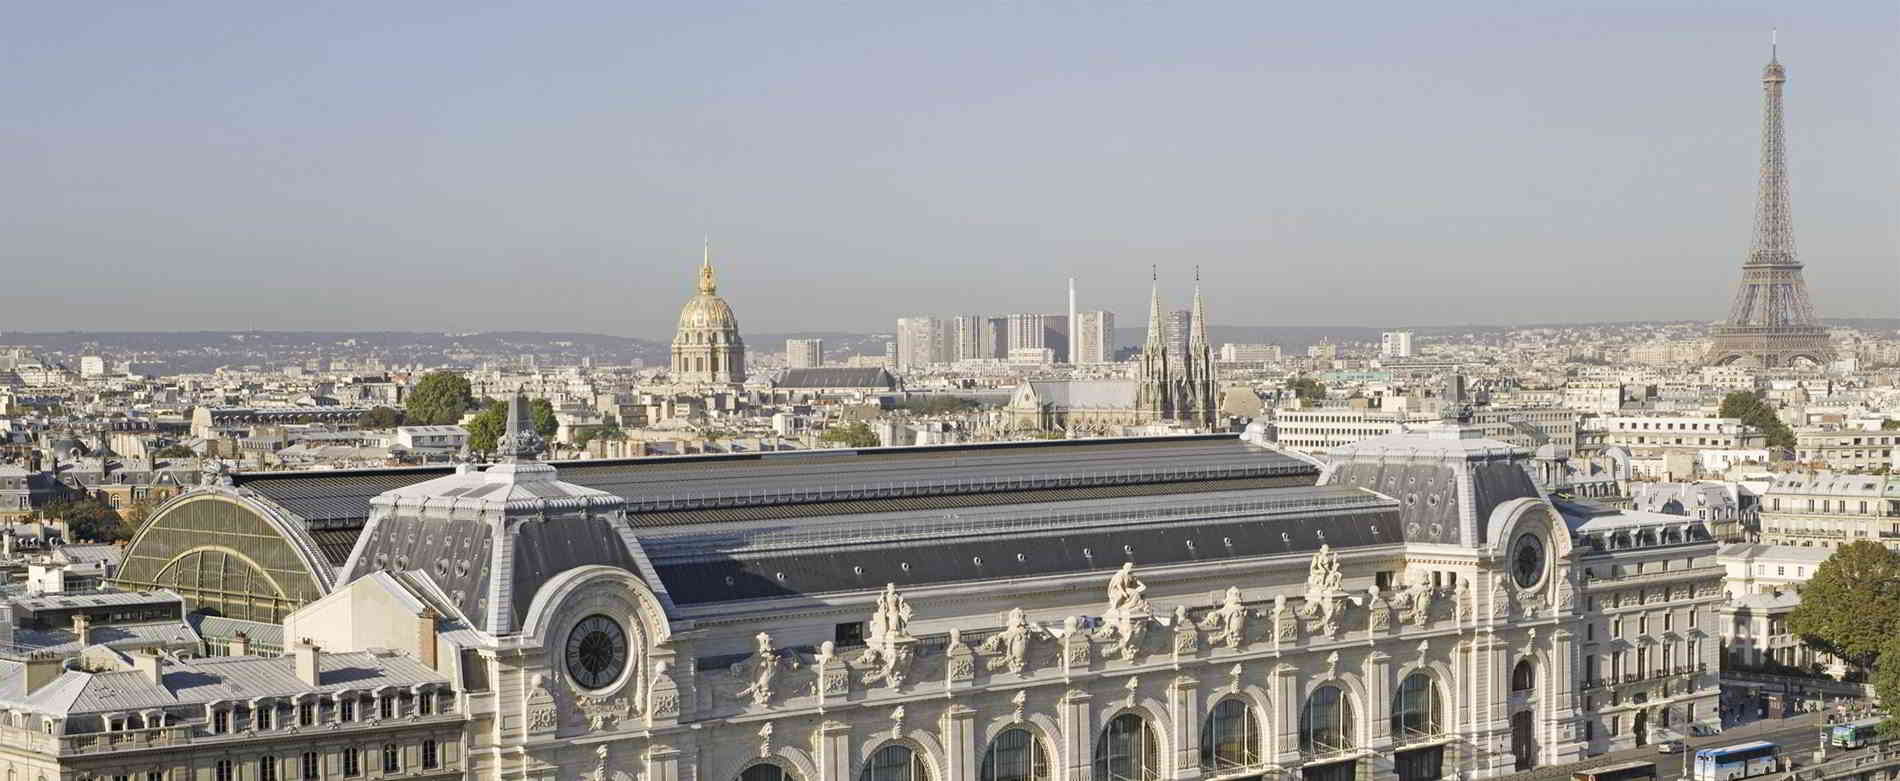 paris rooftop high view